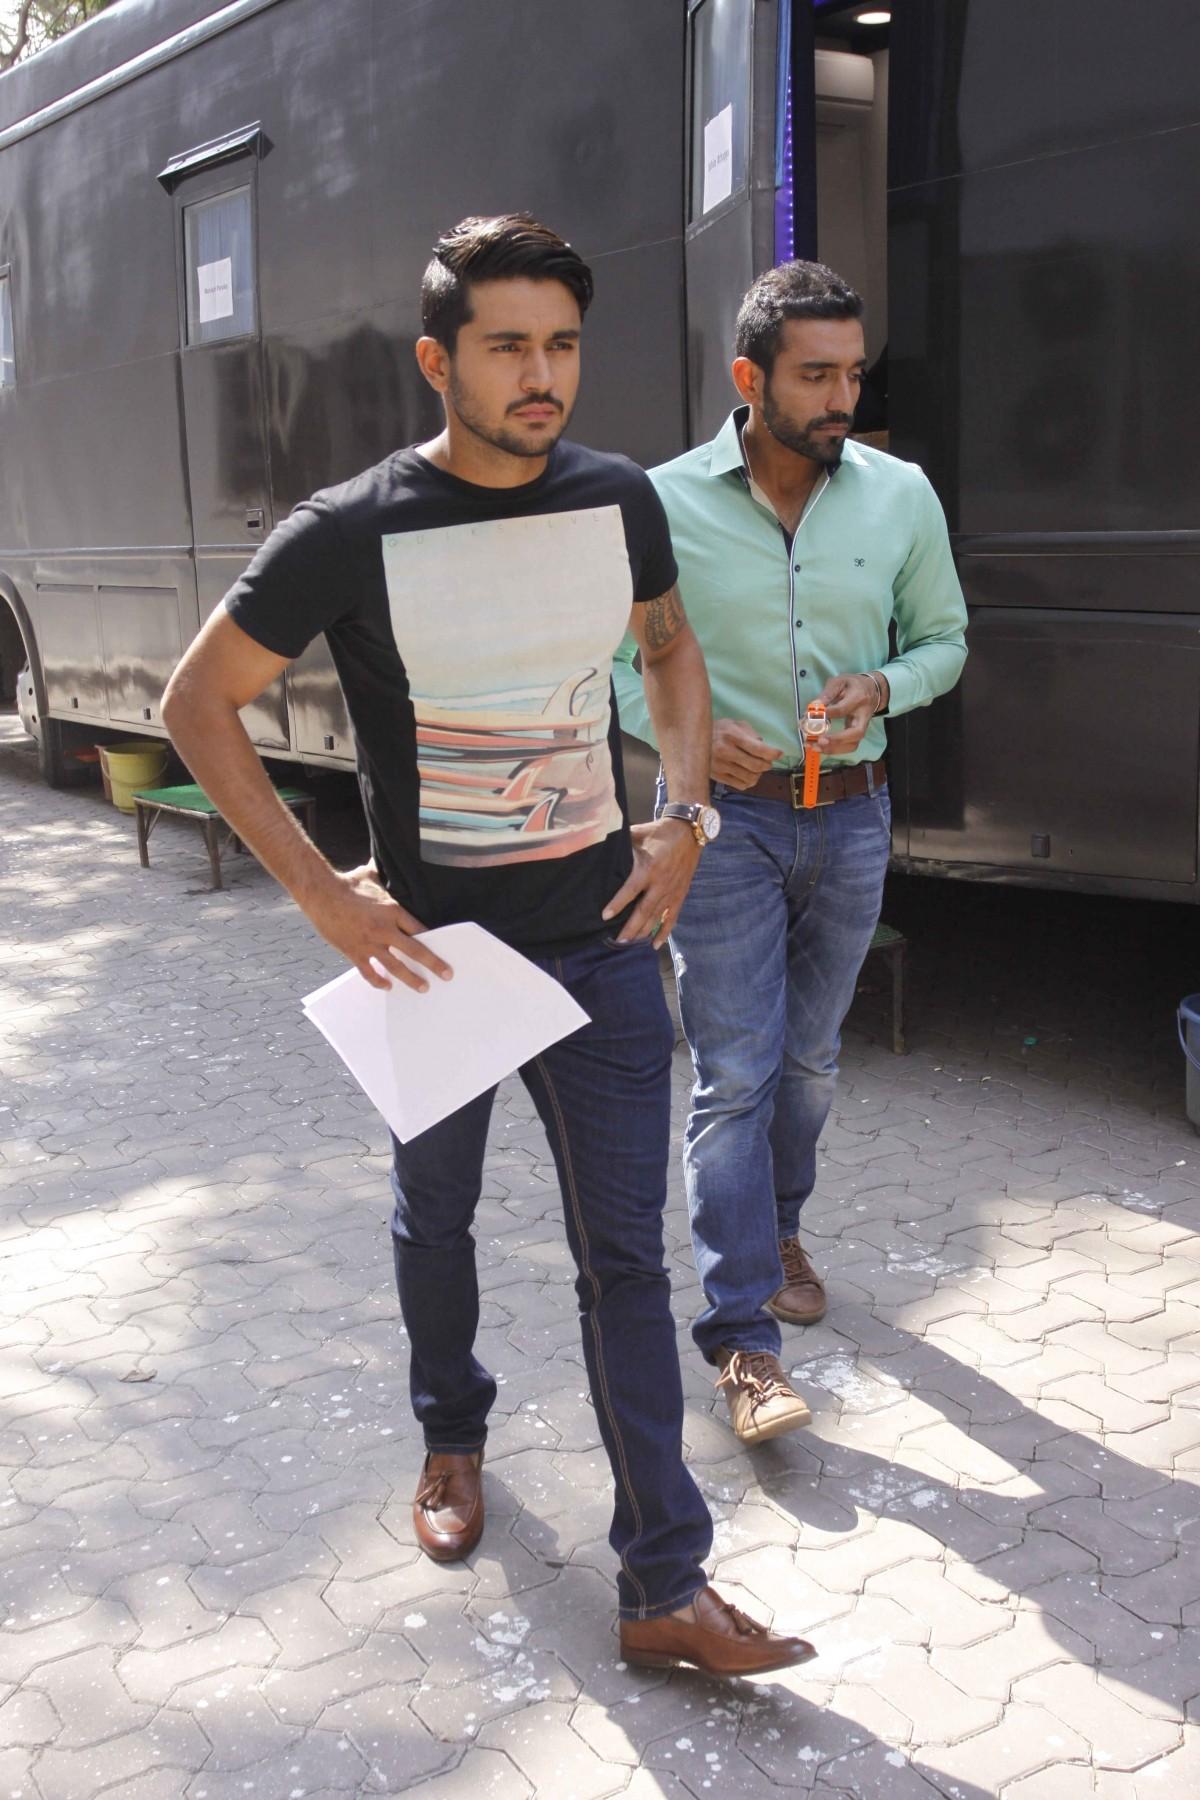 Manish Pandey and Robin Uthappa